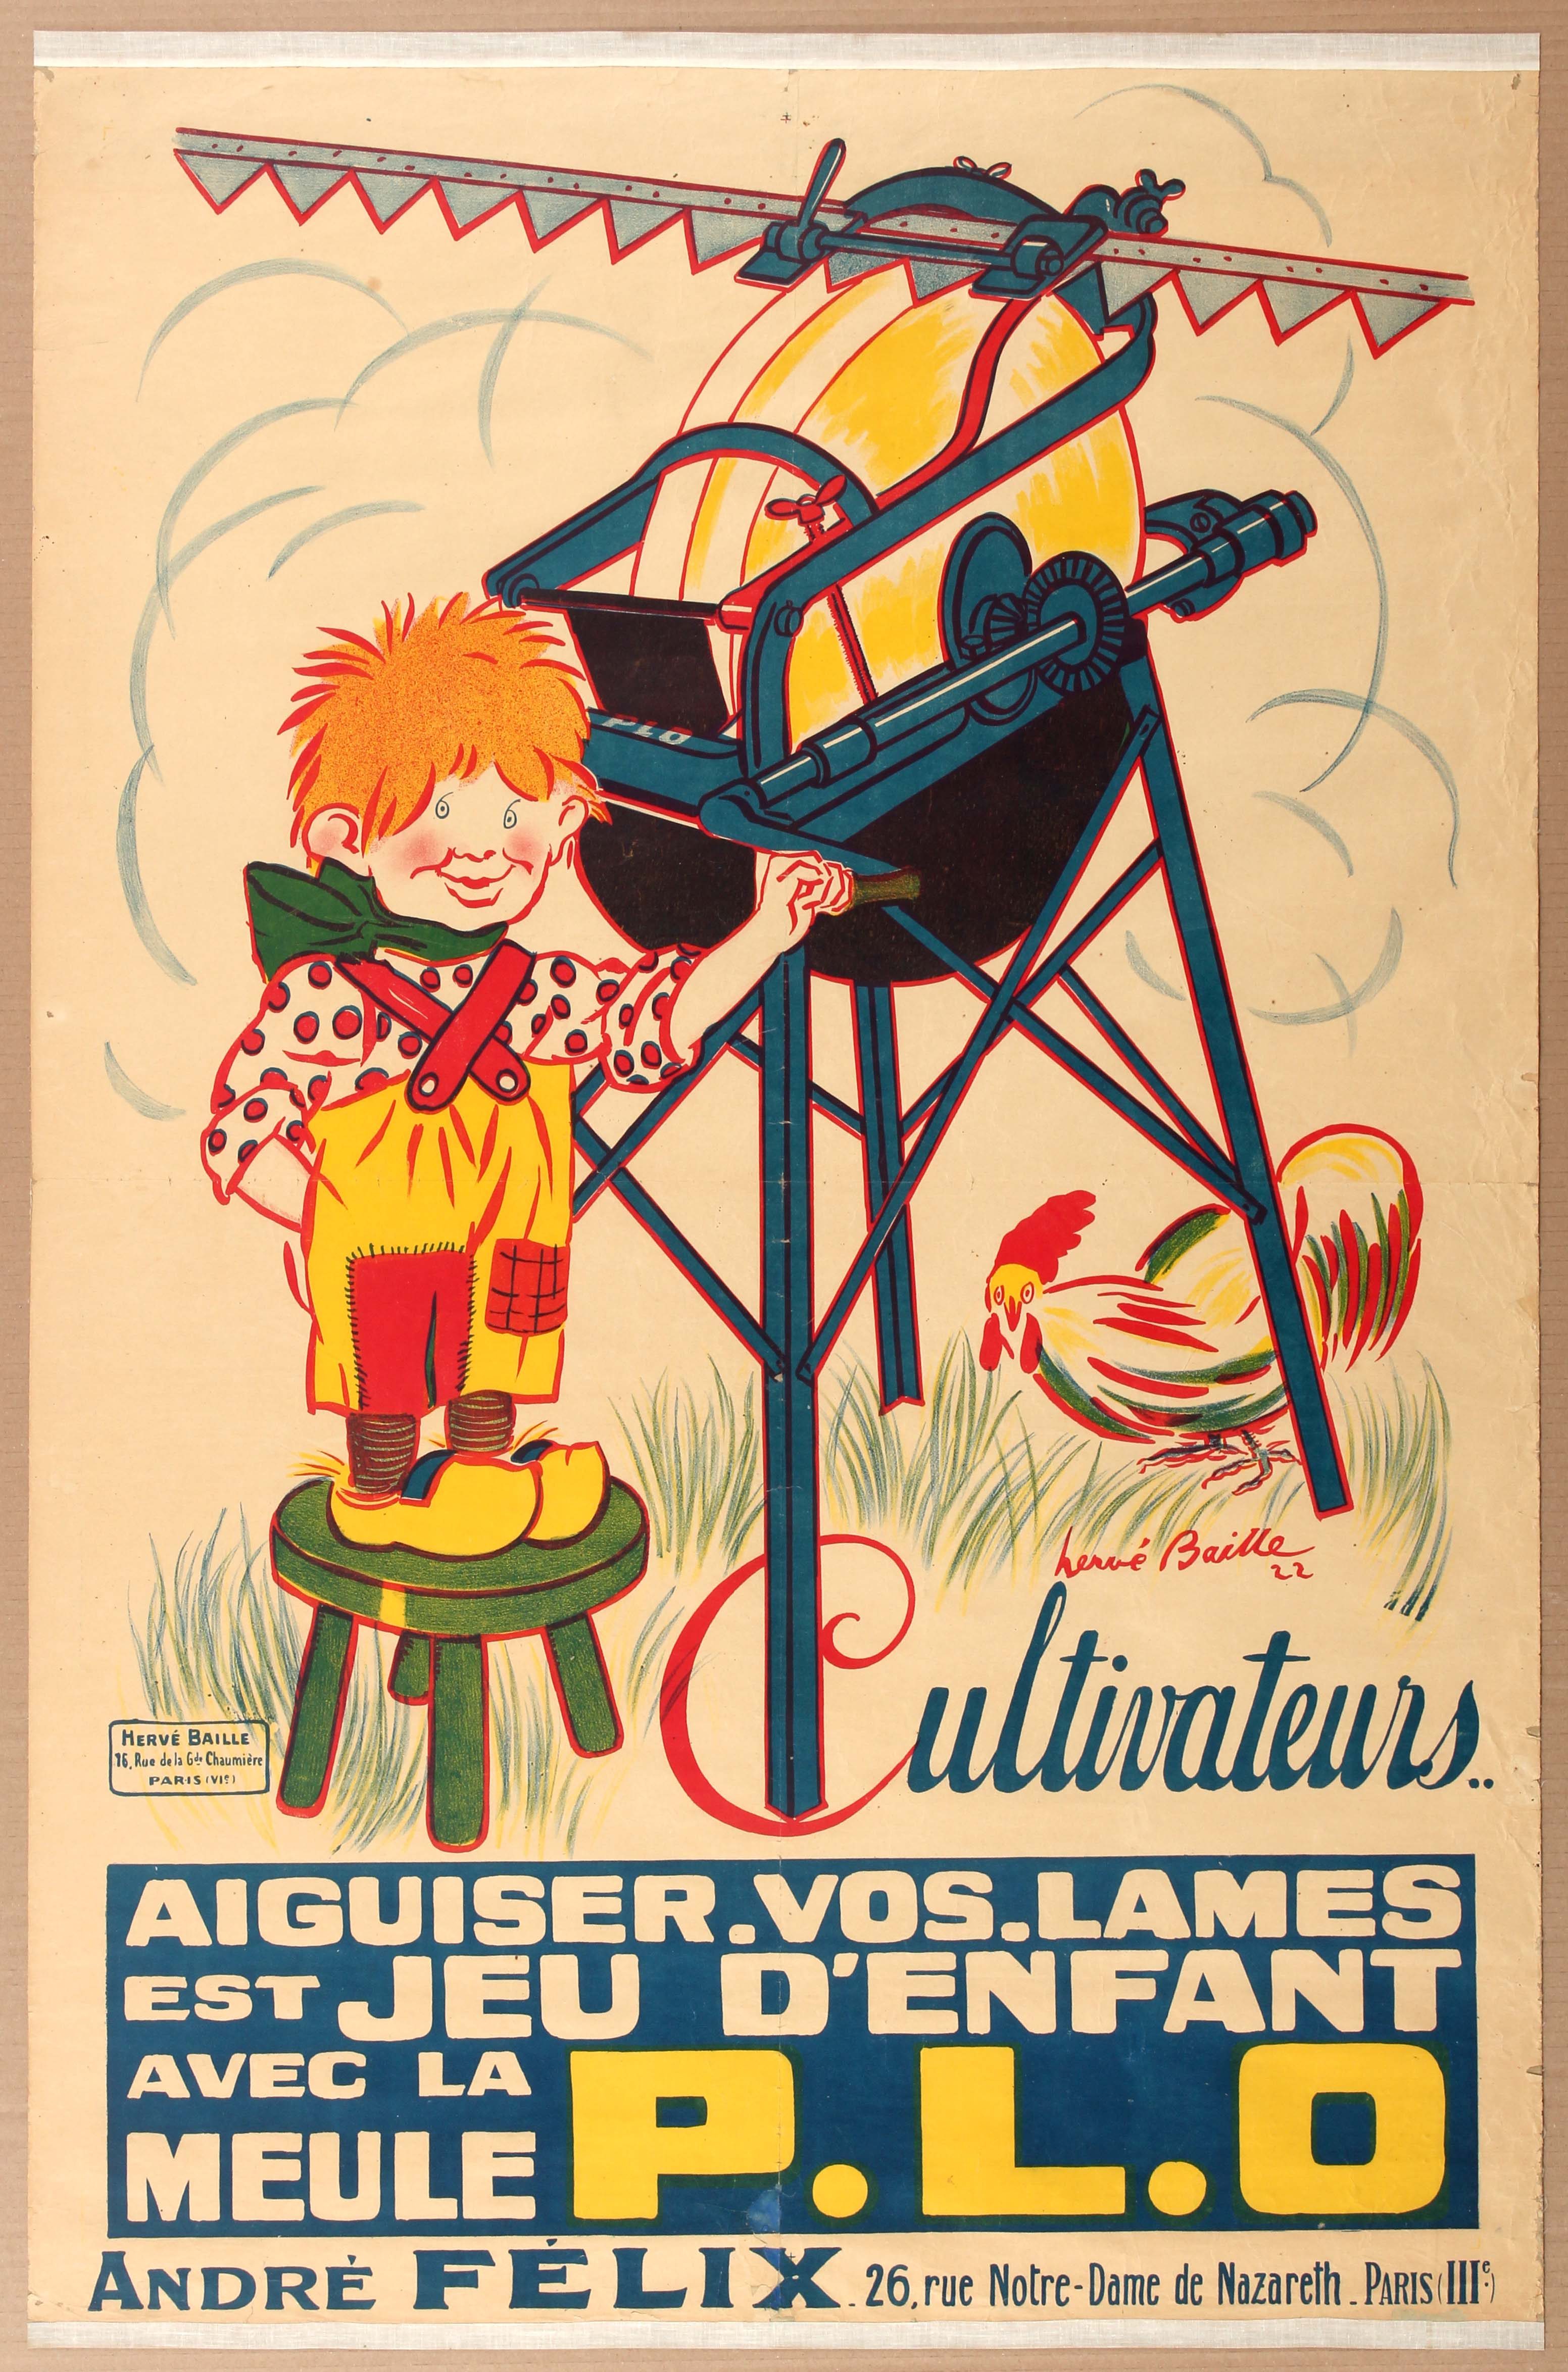 Lot 1202 - Advertising Poster Grindstone Farm Equipment